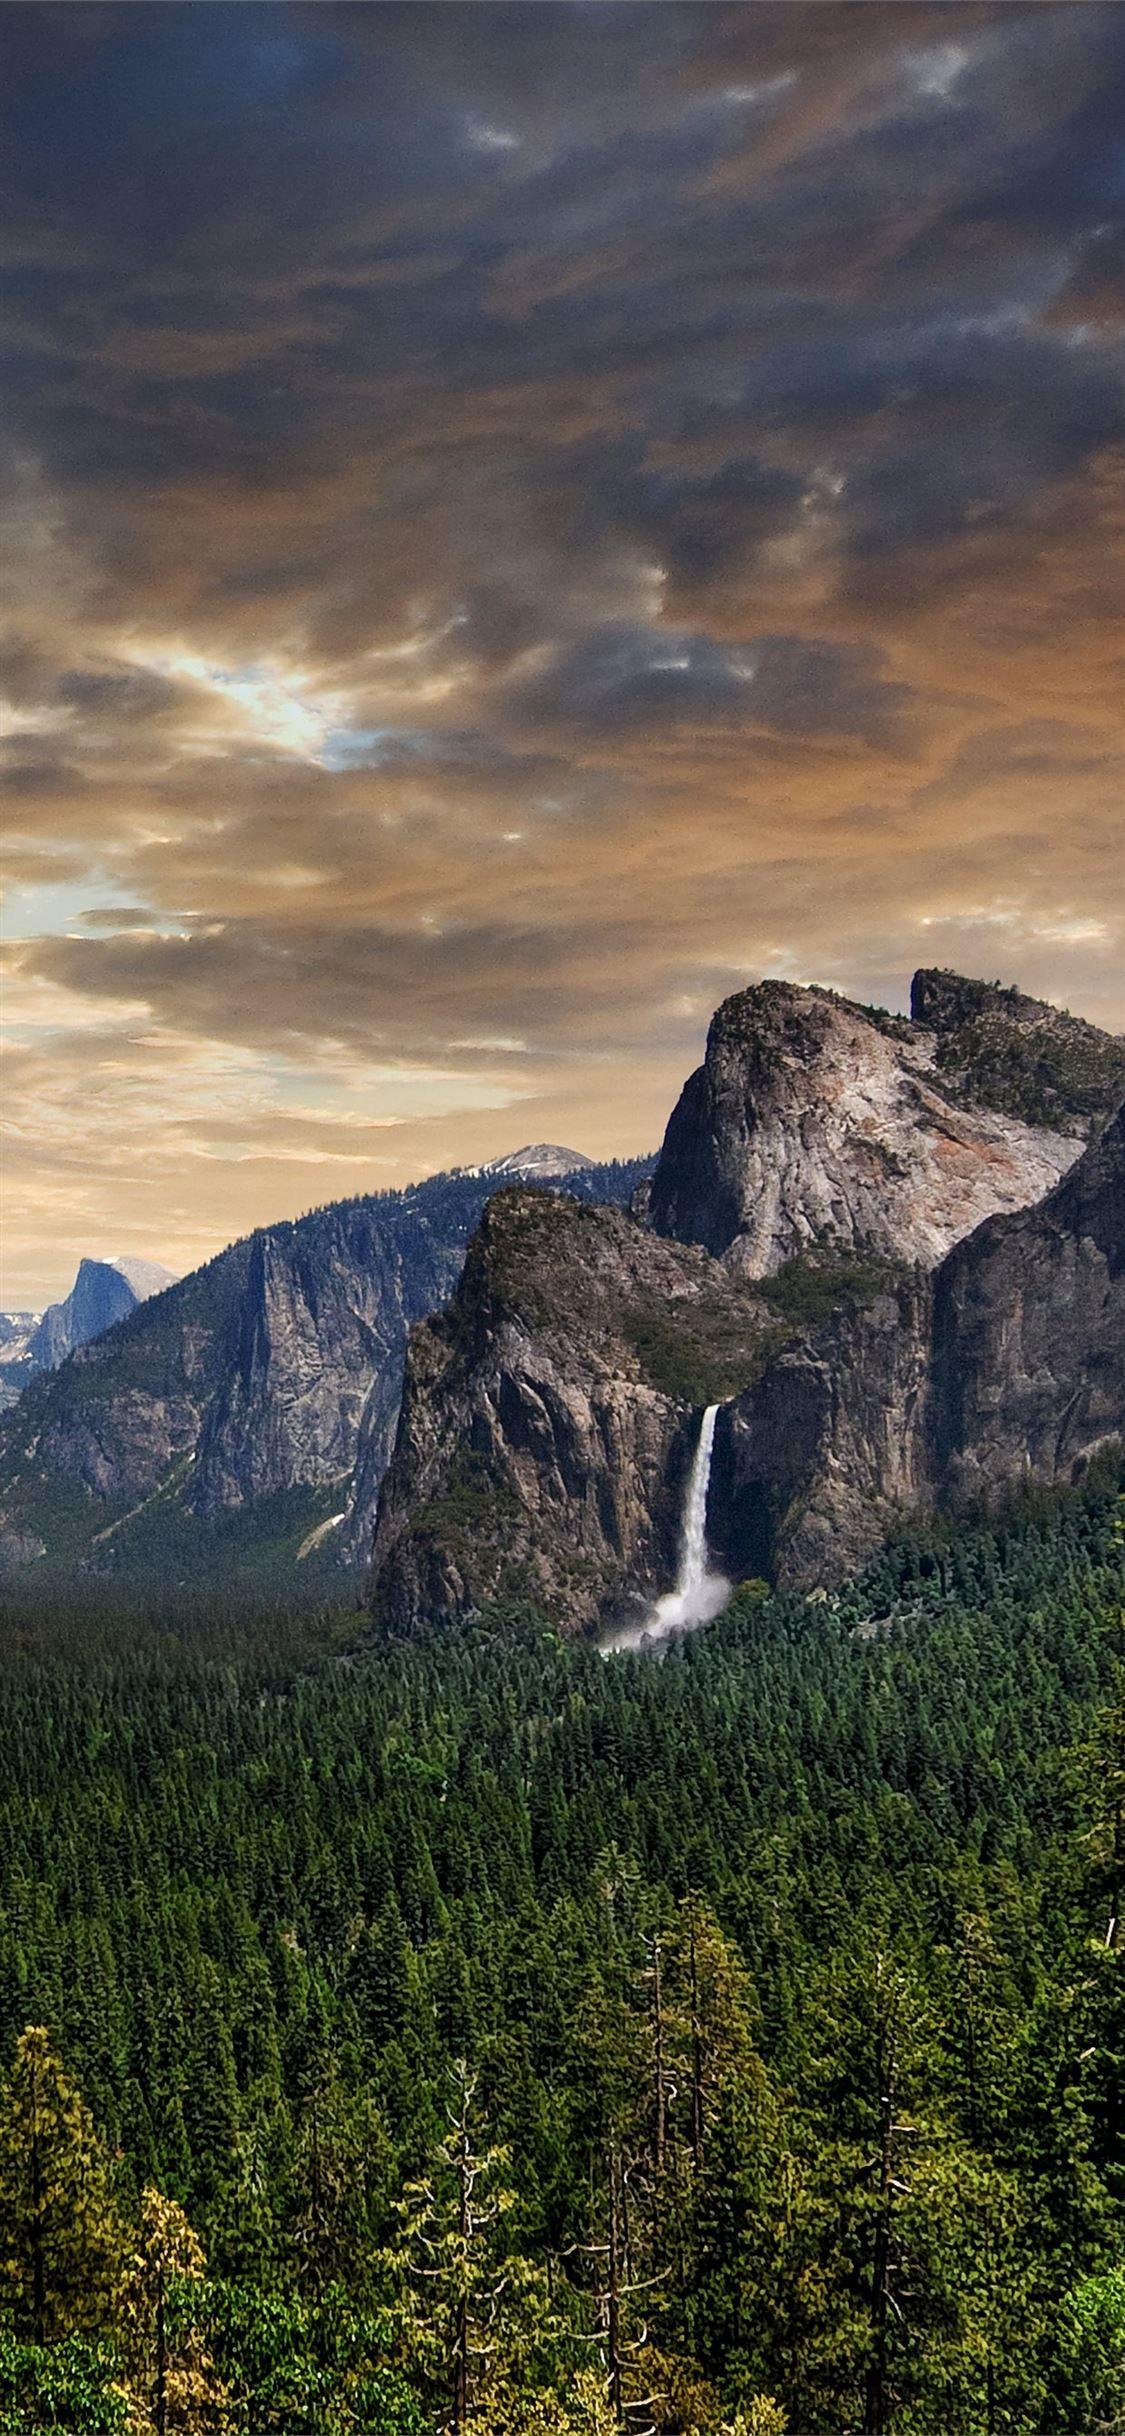 Yosemite Valley Yosemitevalley 100mostbeautifulplacestovisit California Unitedstates Iphone11wallpaper In 2020 Yosemite Valley Yosemite Nature Pictures